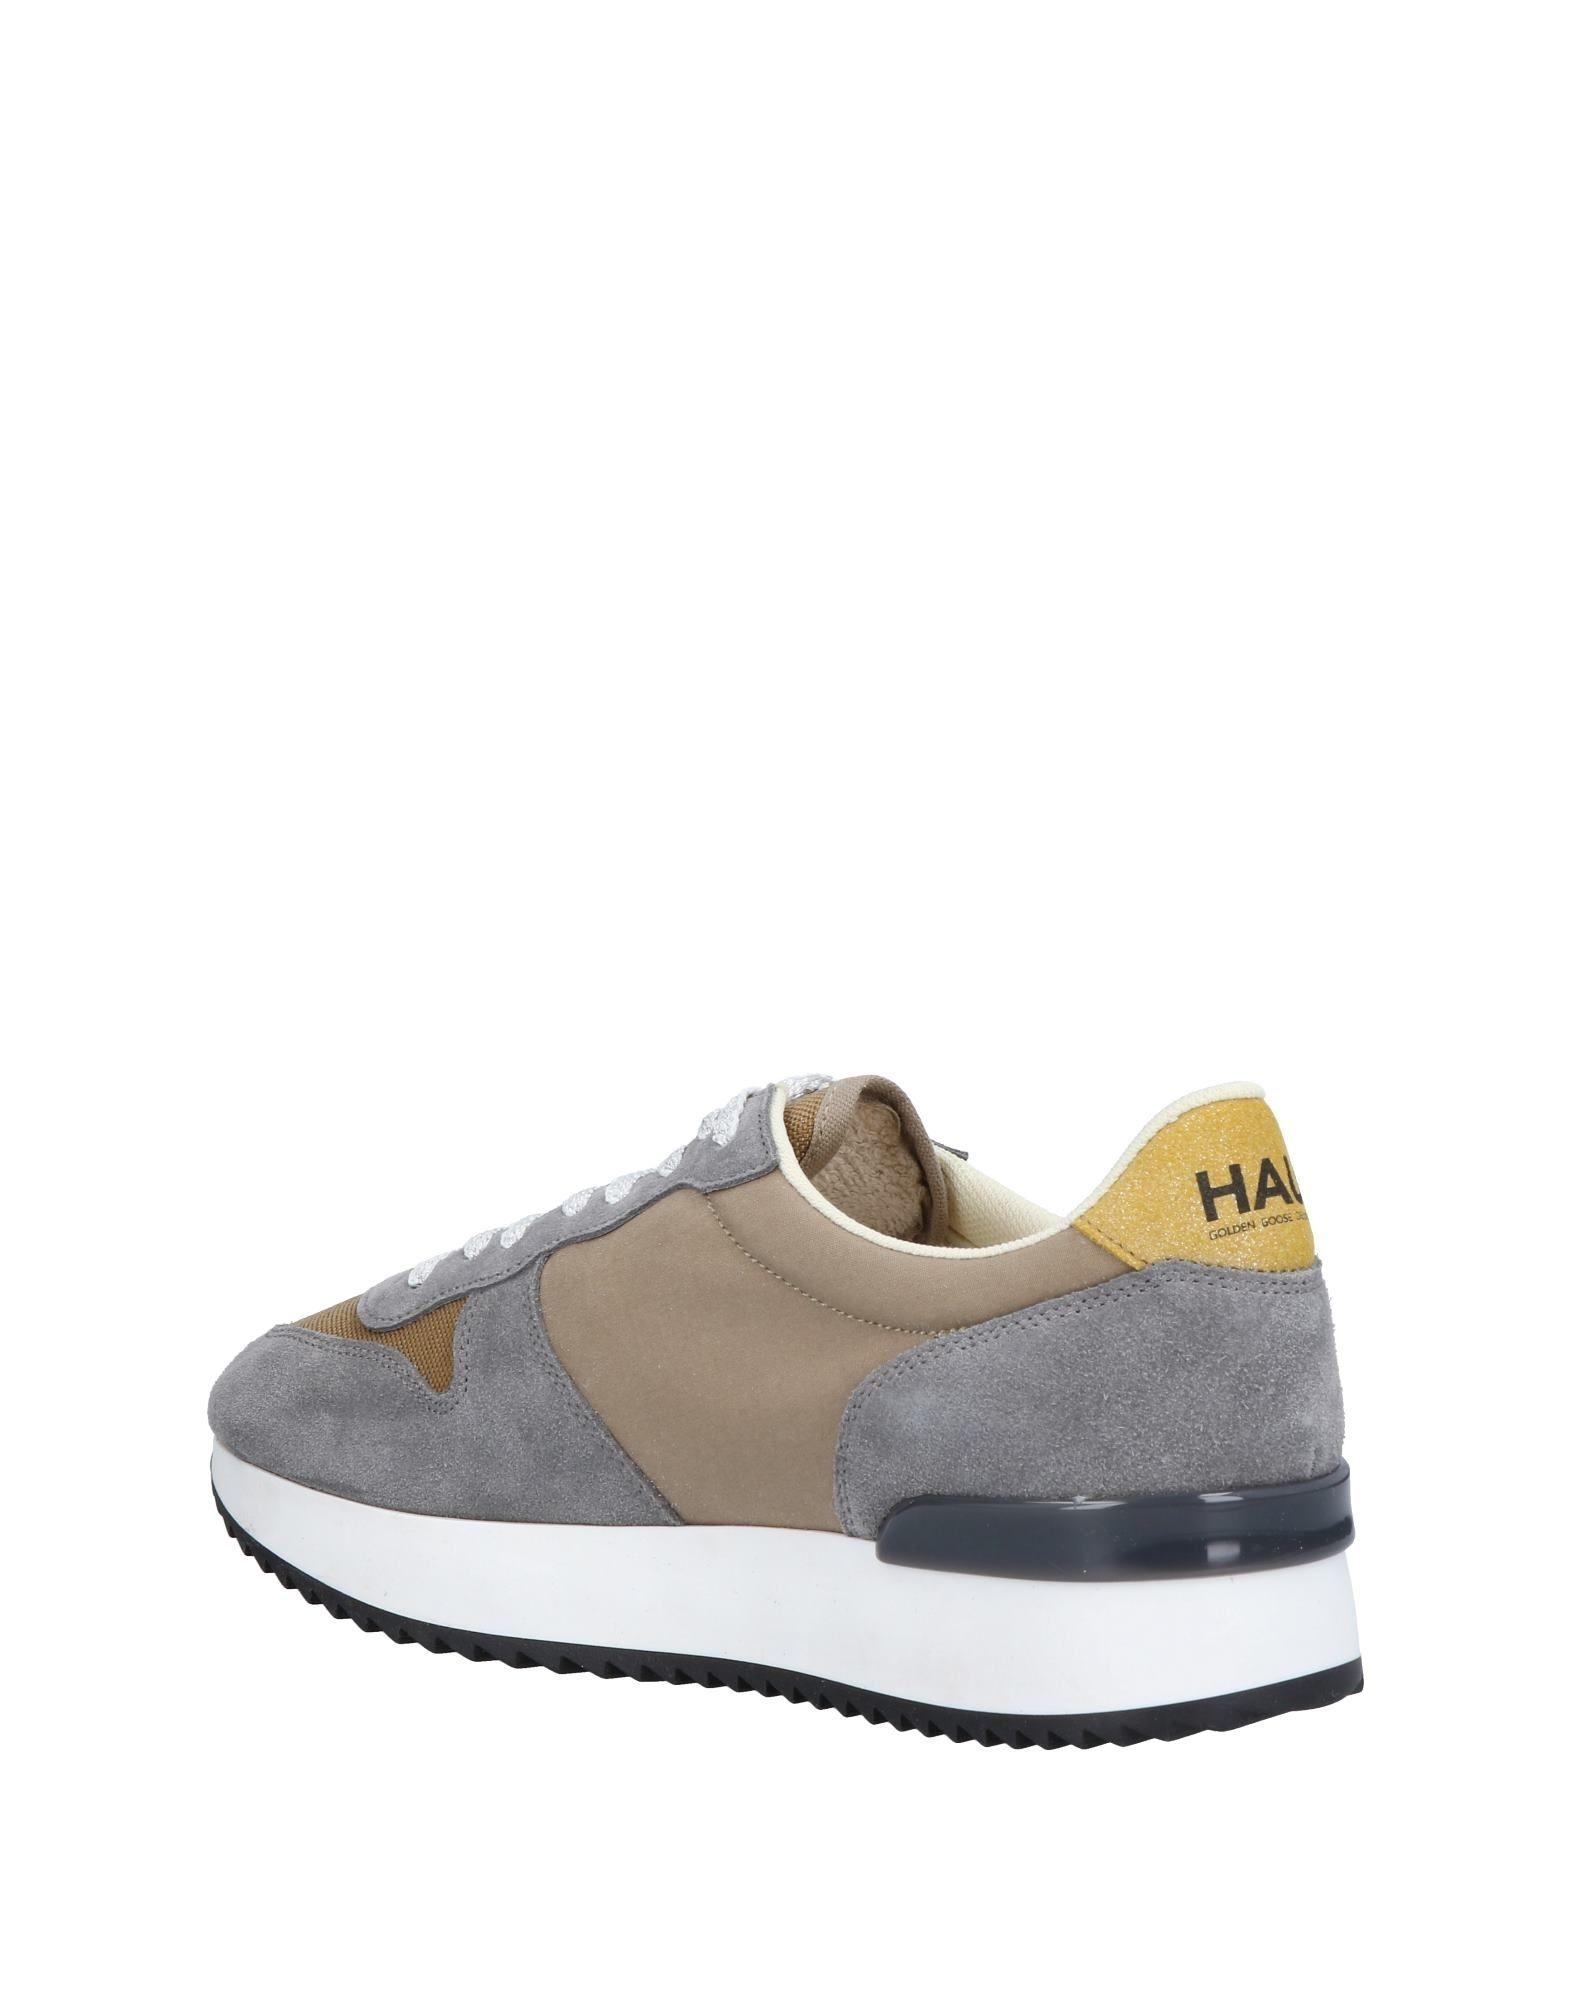 Stilvolle billige billige billige Schuhe Haus Golden Goose Sneakers Damen  11470927RR ddc6b9